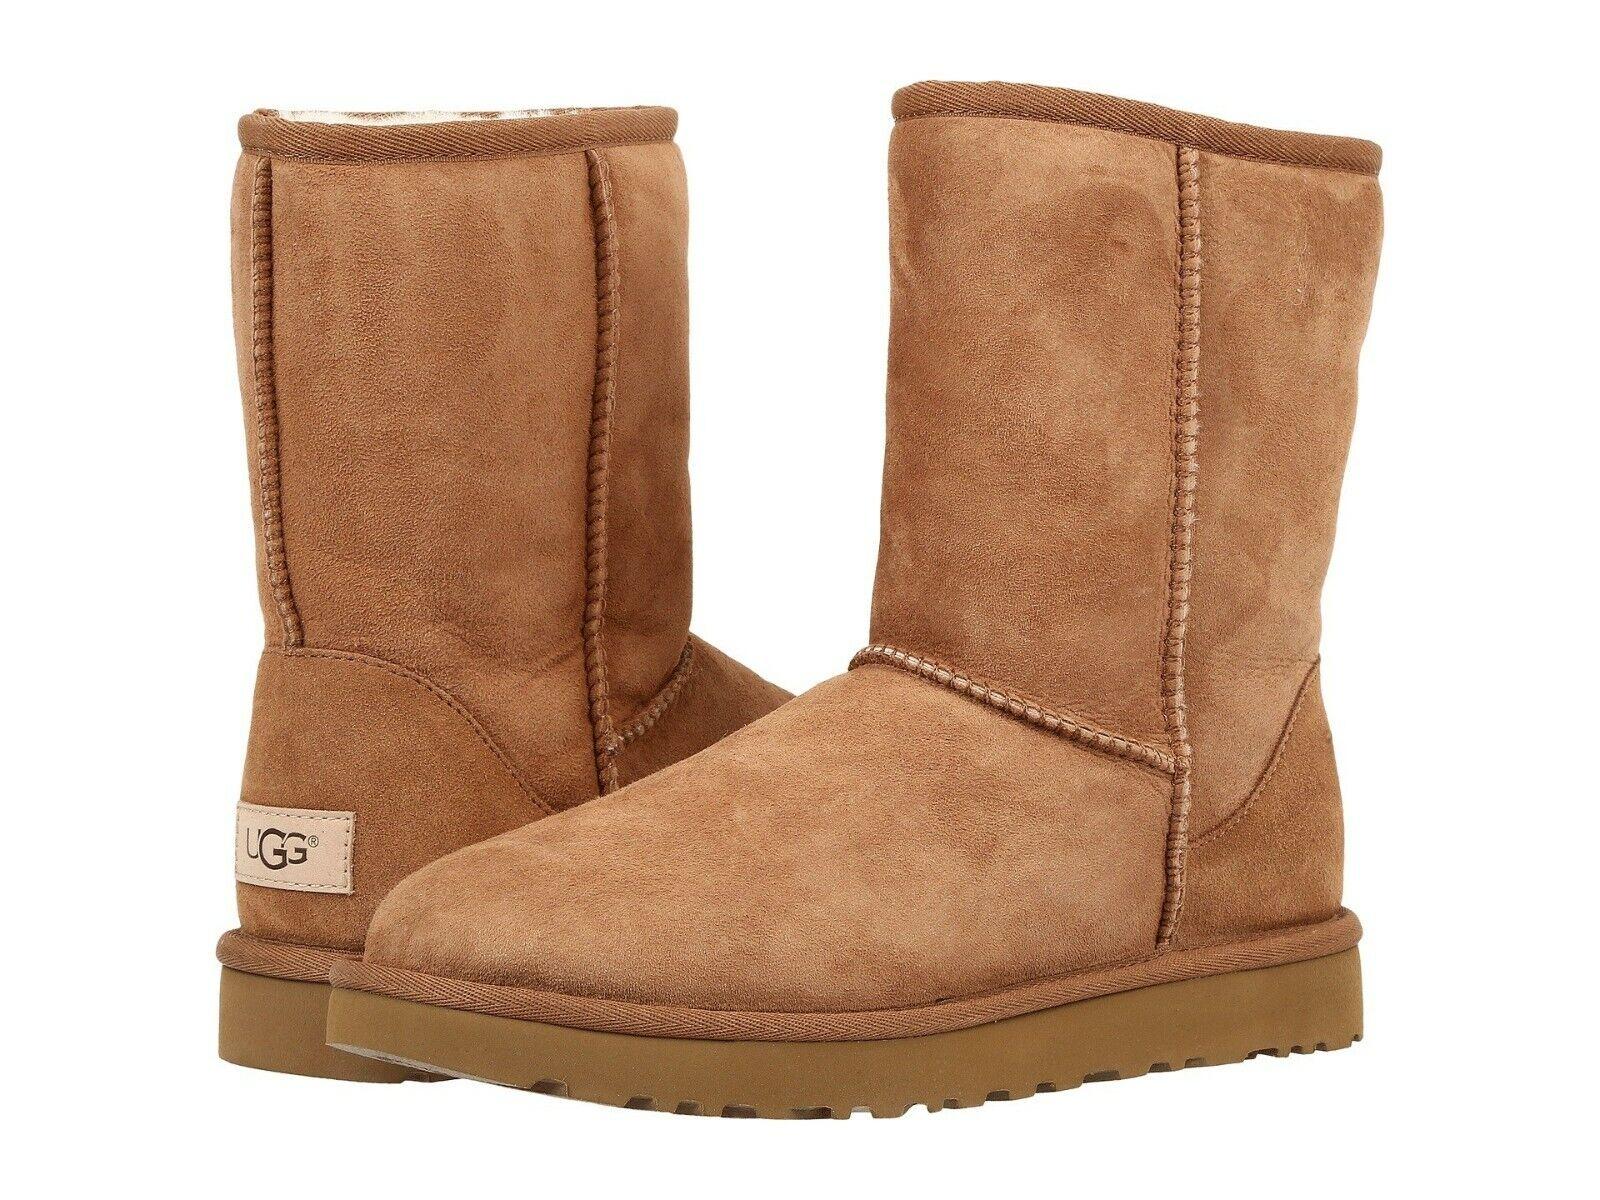 Women's Shoes UGG CLASSIC SHORT II Mid-Calf Boots 1016223 CH